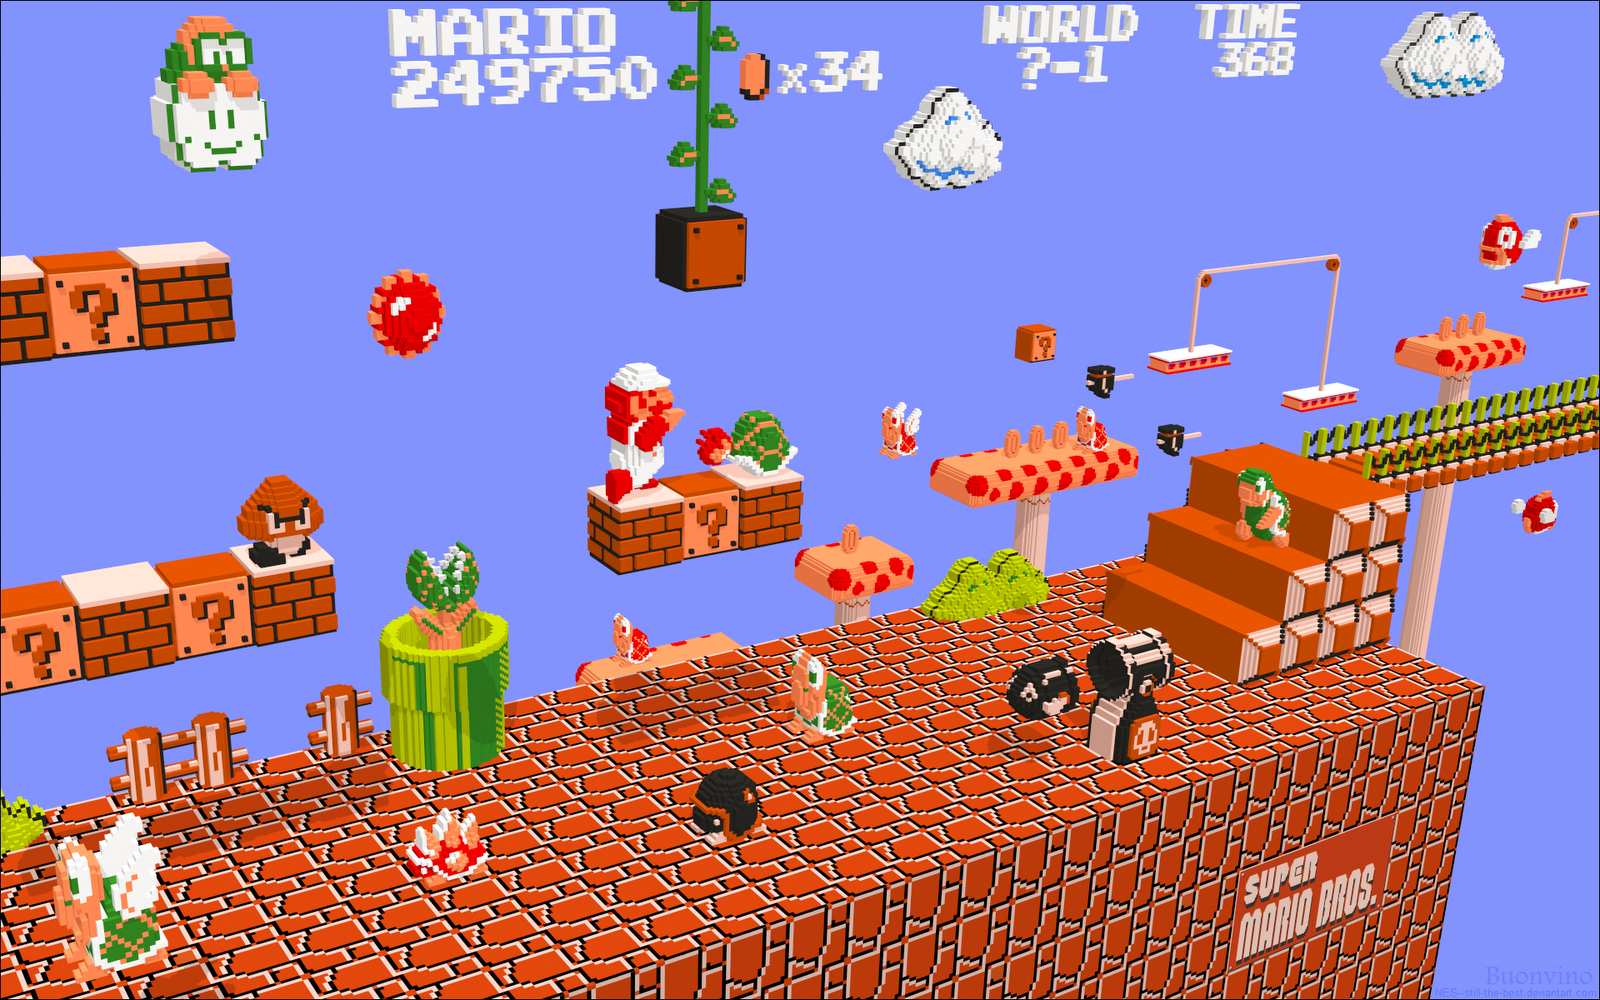 Old School Nintendo Emulation